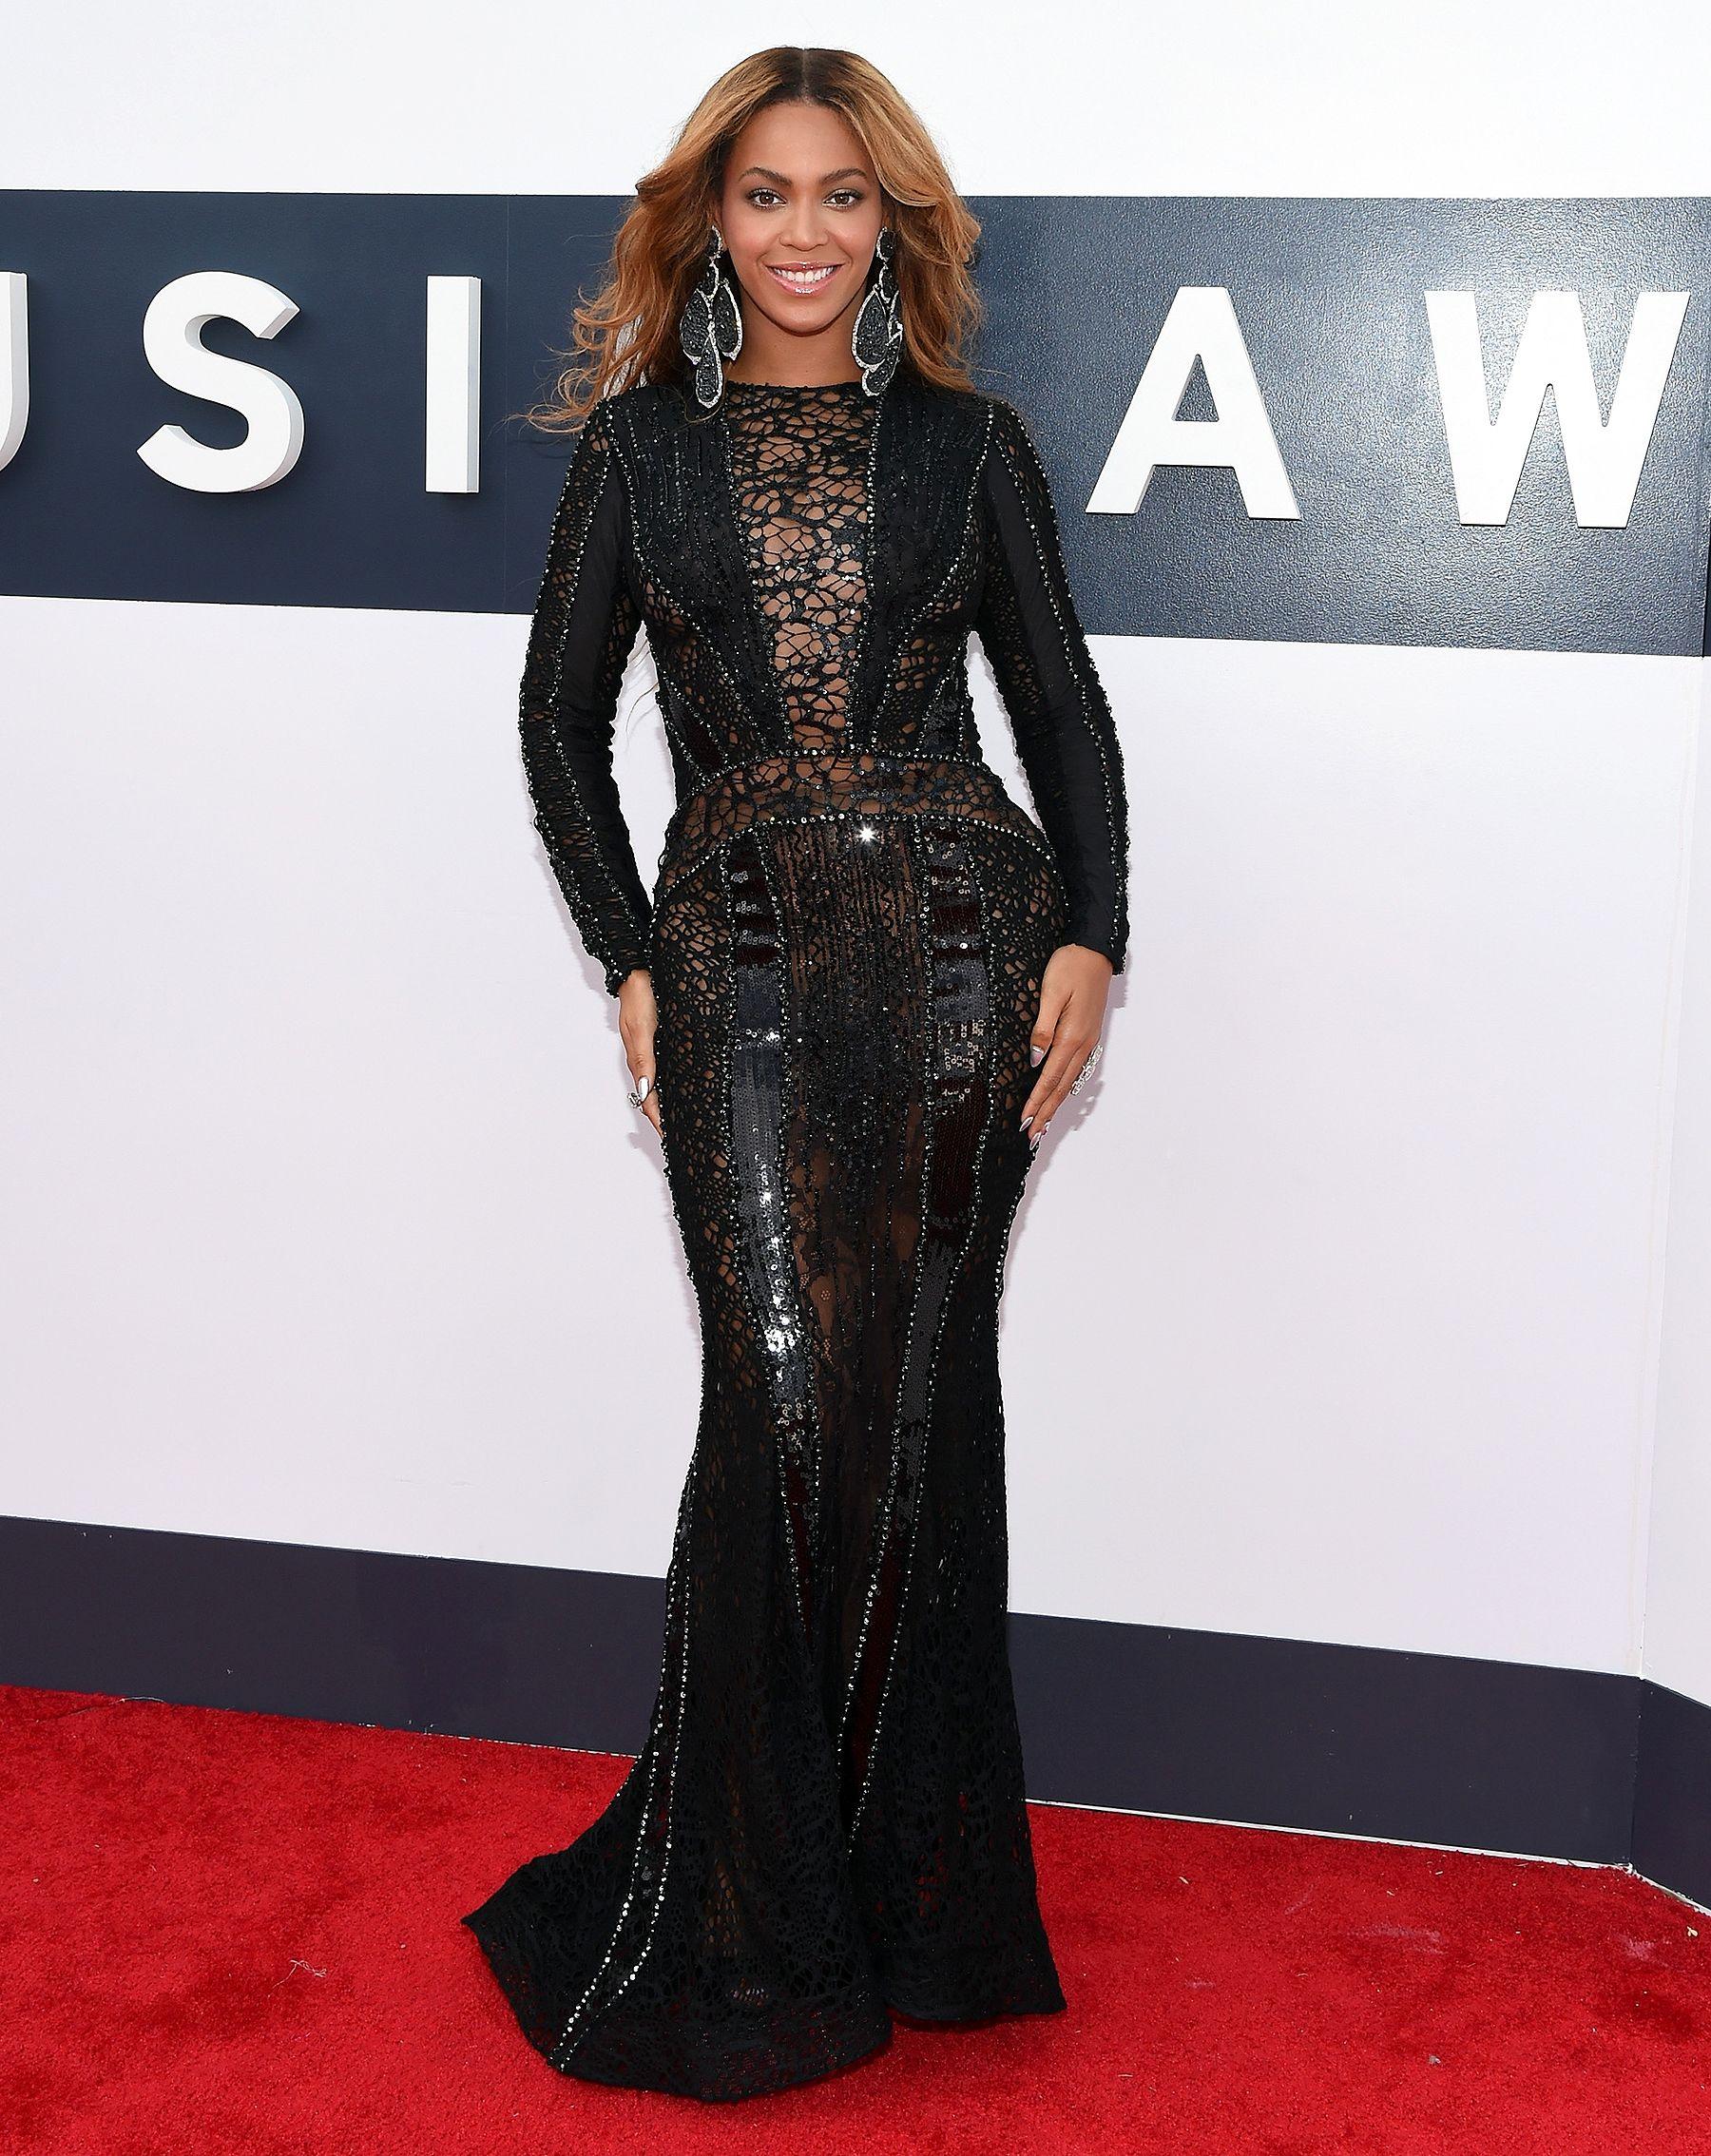 Black dress we heart it - Beyonce In Black Dress Hot Dressfashion Stylesmtvwe Heart Itpopsugarthe Star